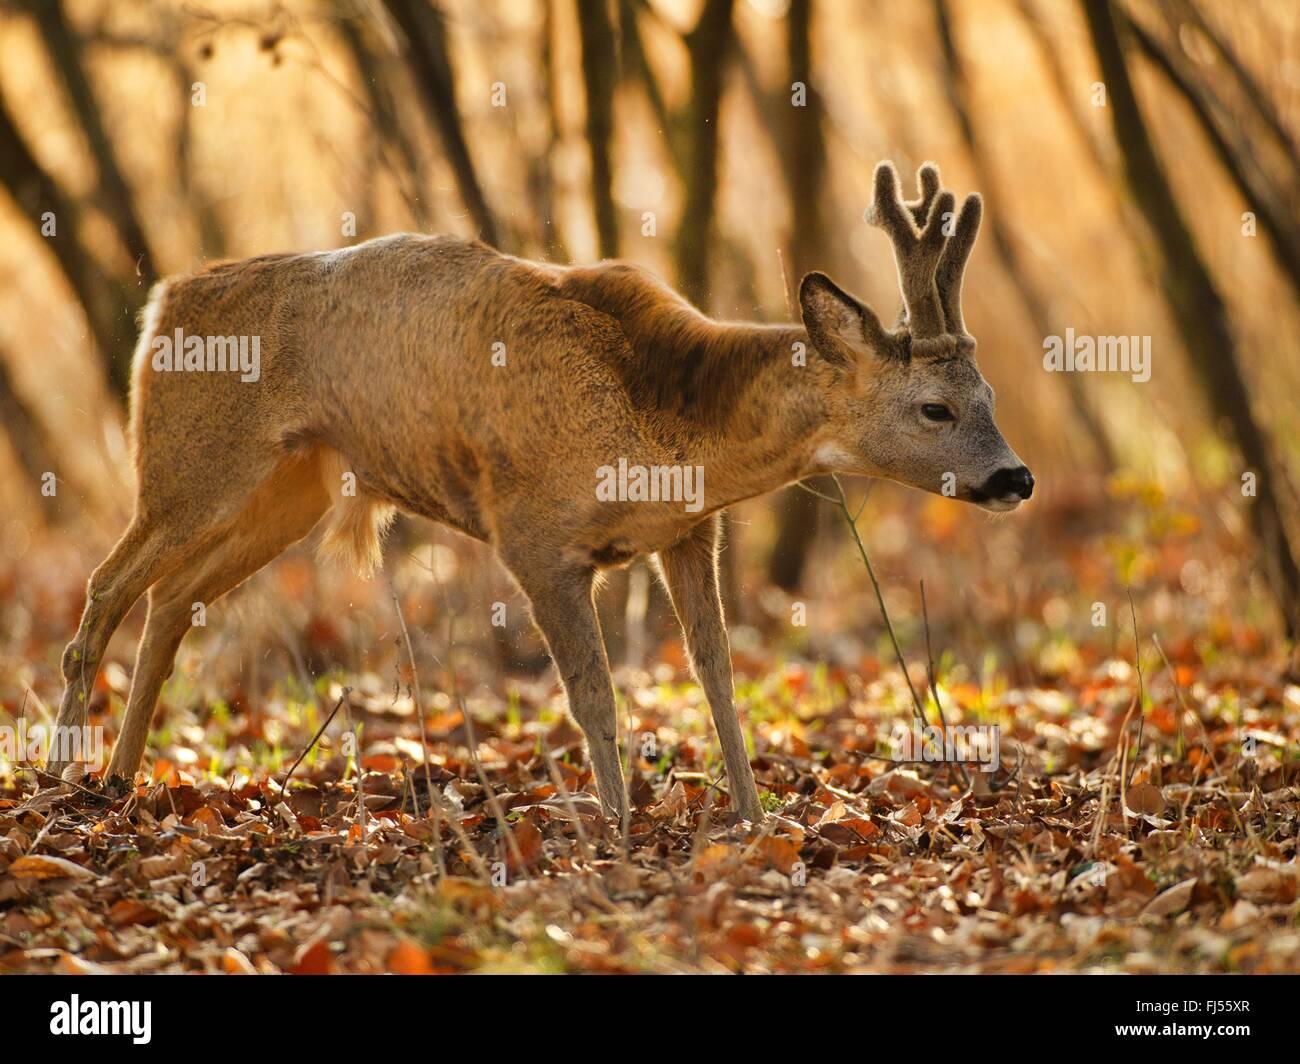 roe deer (Capreolus capreolus), roe buck standing in autumn foliage, antler with velvet, Germany, Brandenburg - Stock Image